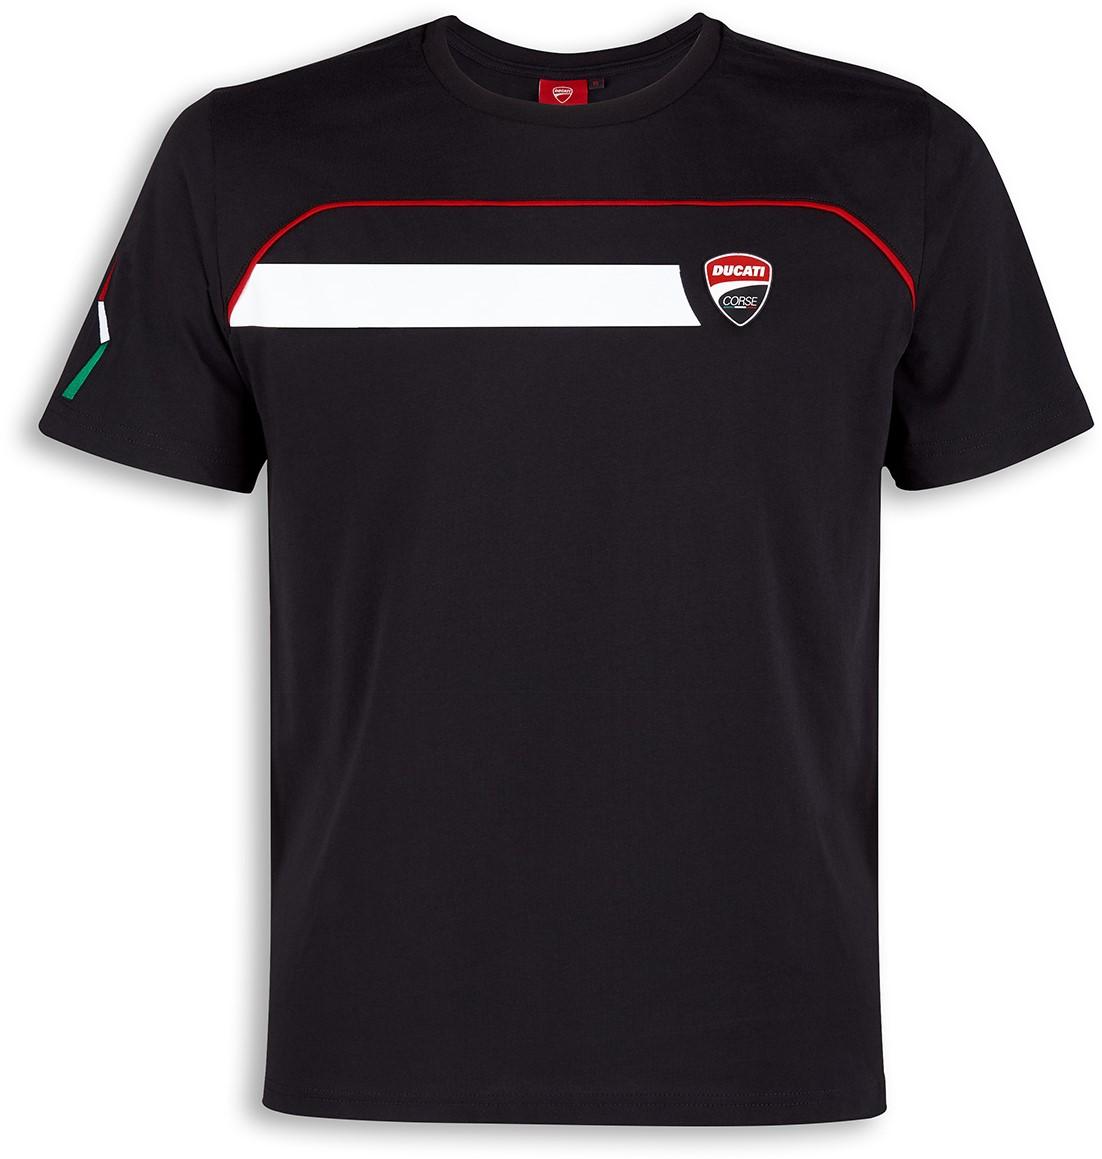 【DUCATI performance】Ducati Corse Speed 黑色 T恤 - 「Webike-摩托百貨」